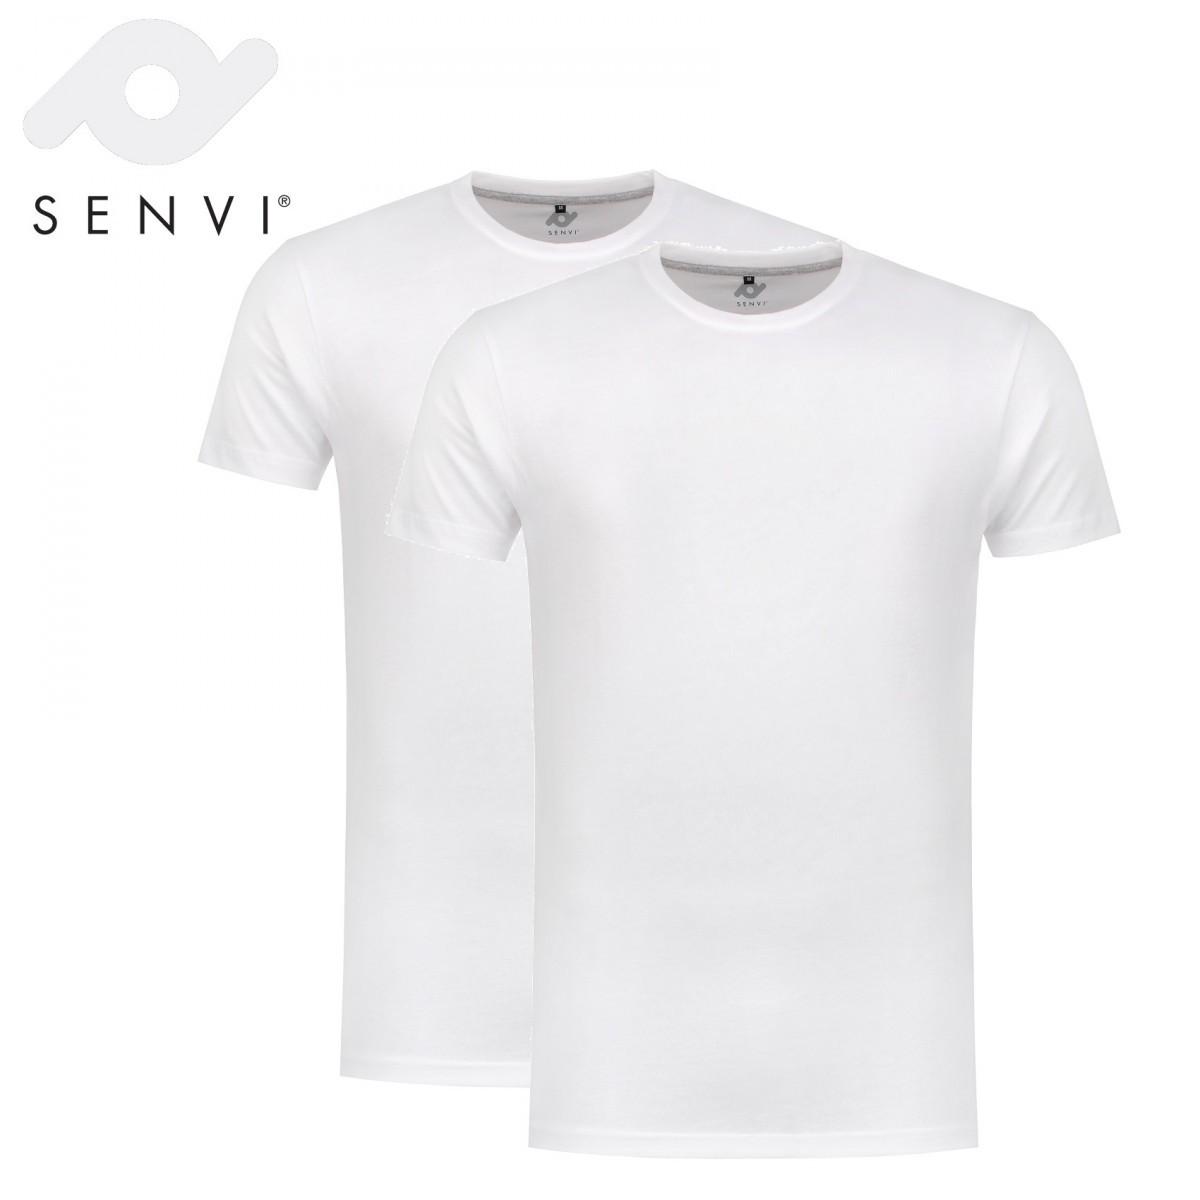 Senvi Basic T-Shirt Wit 2 Pack Maat XXXXL (4XL)